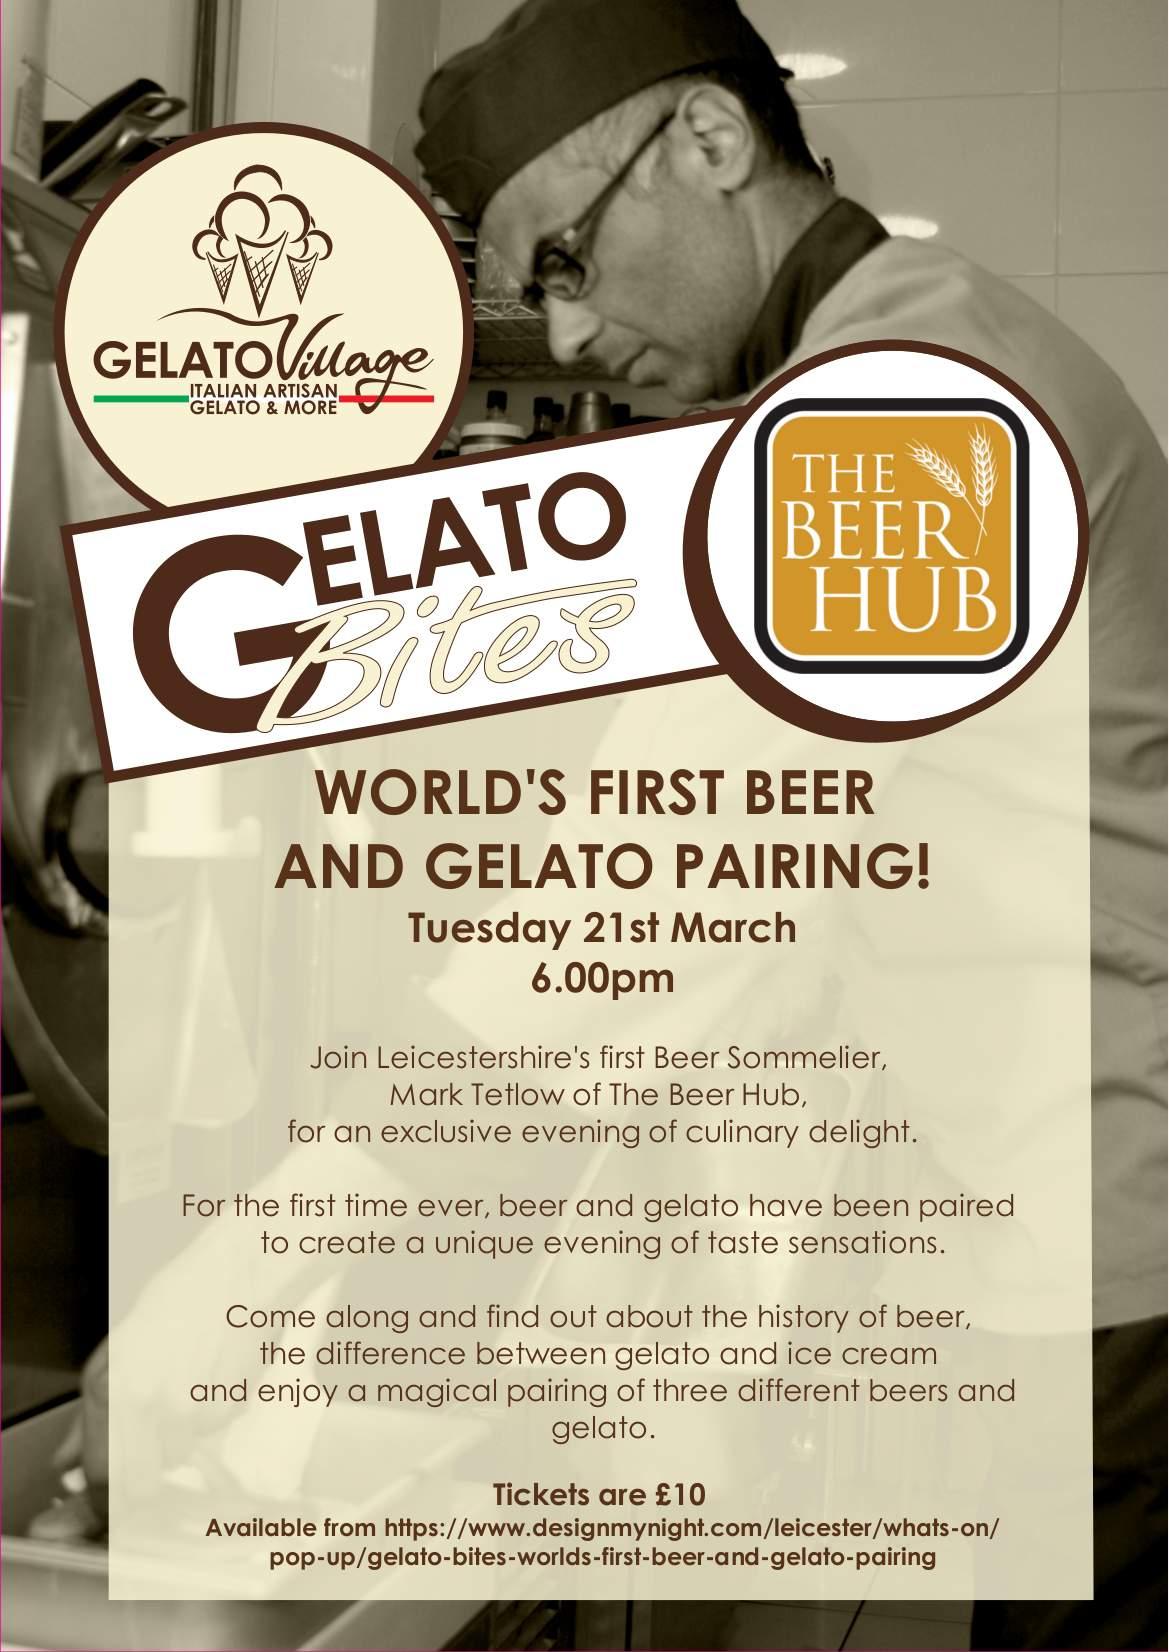 gelato bites poster beer and gelato pairing